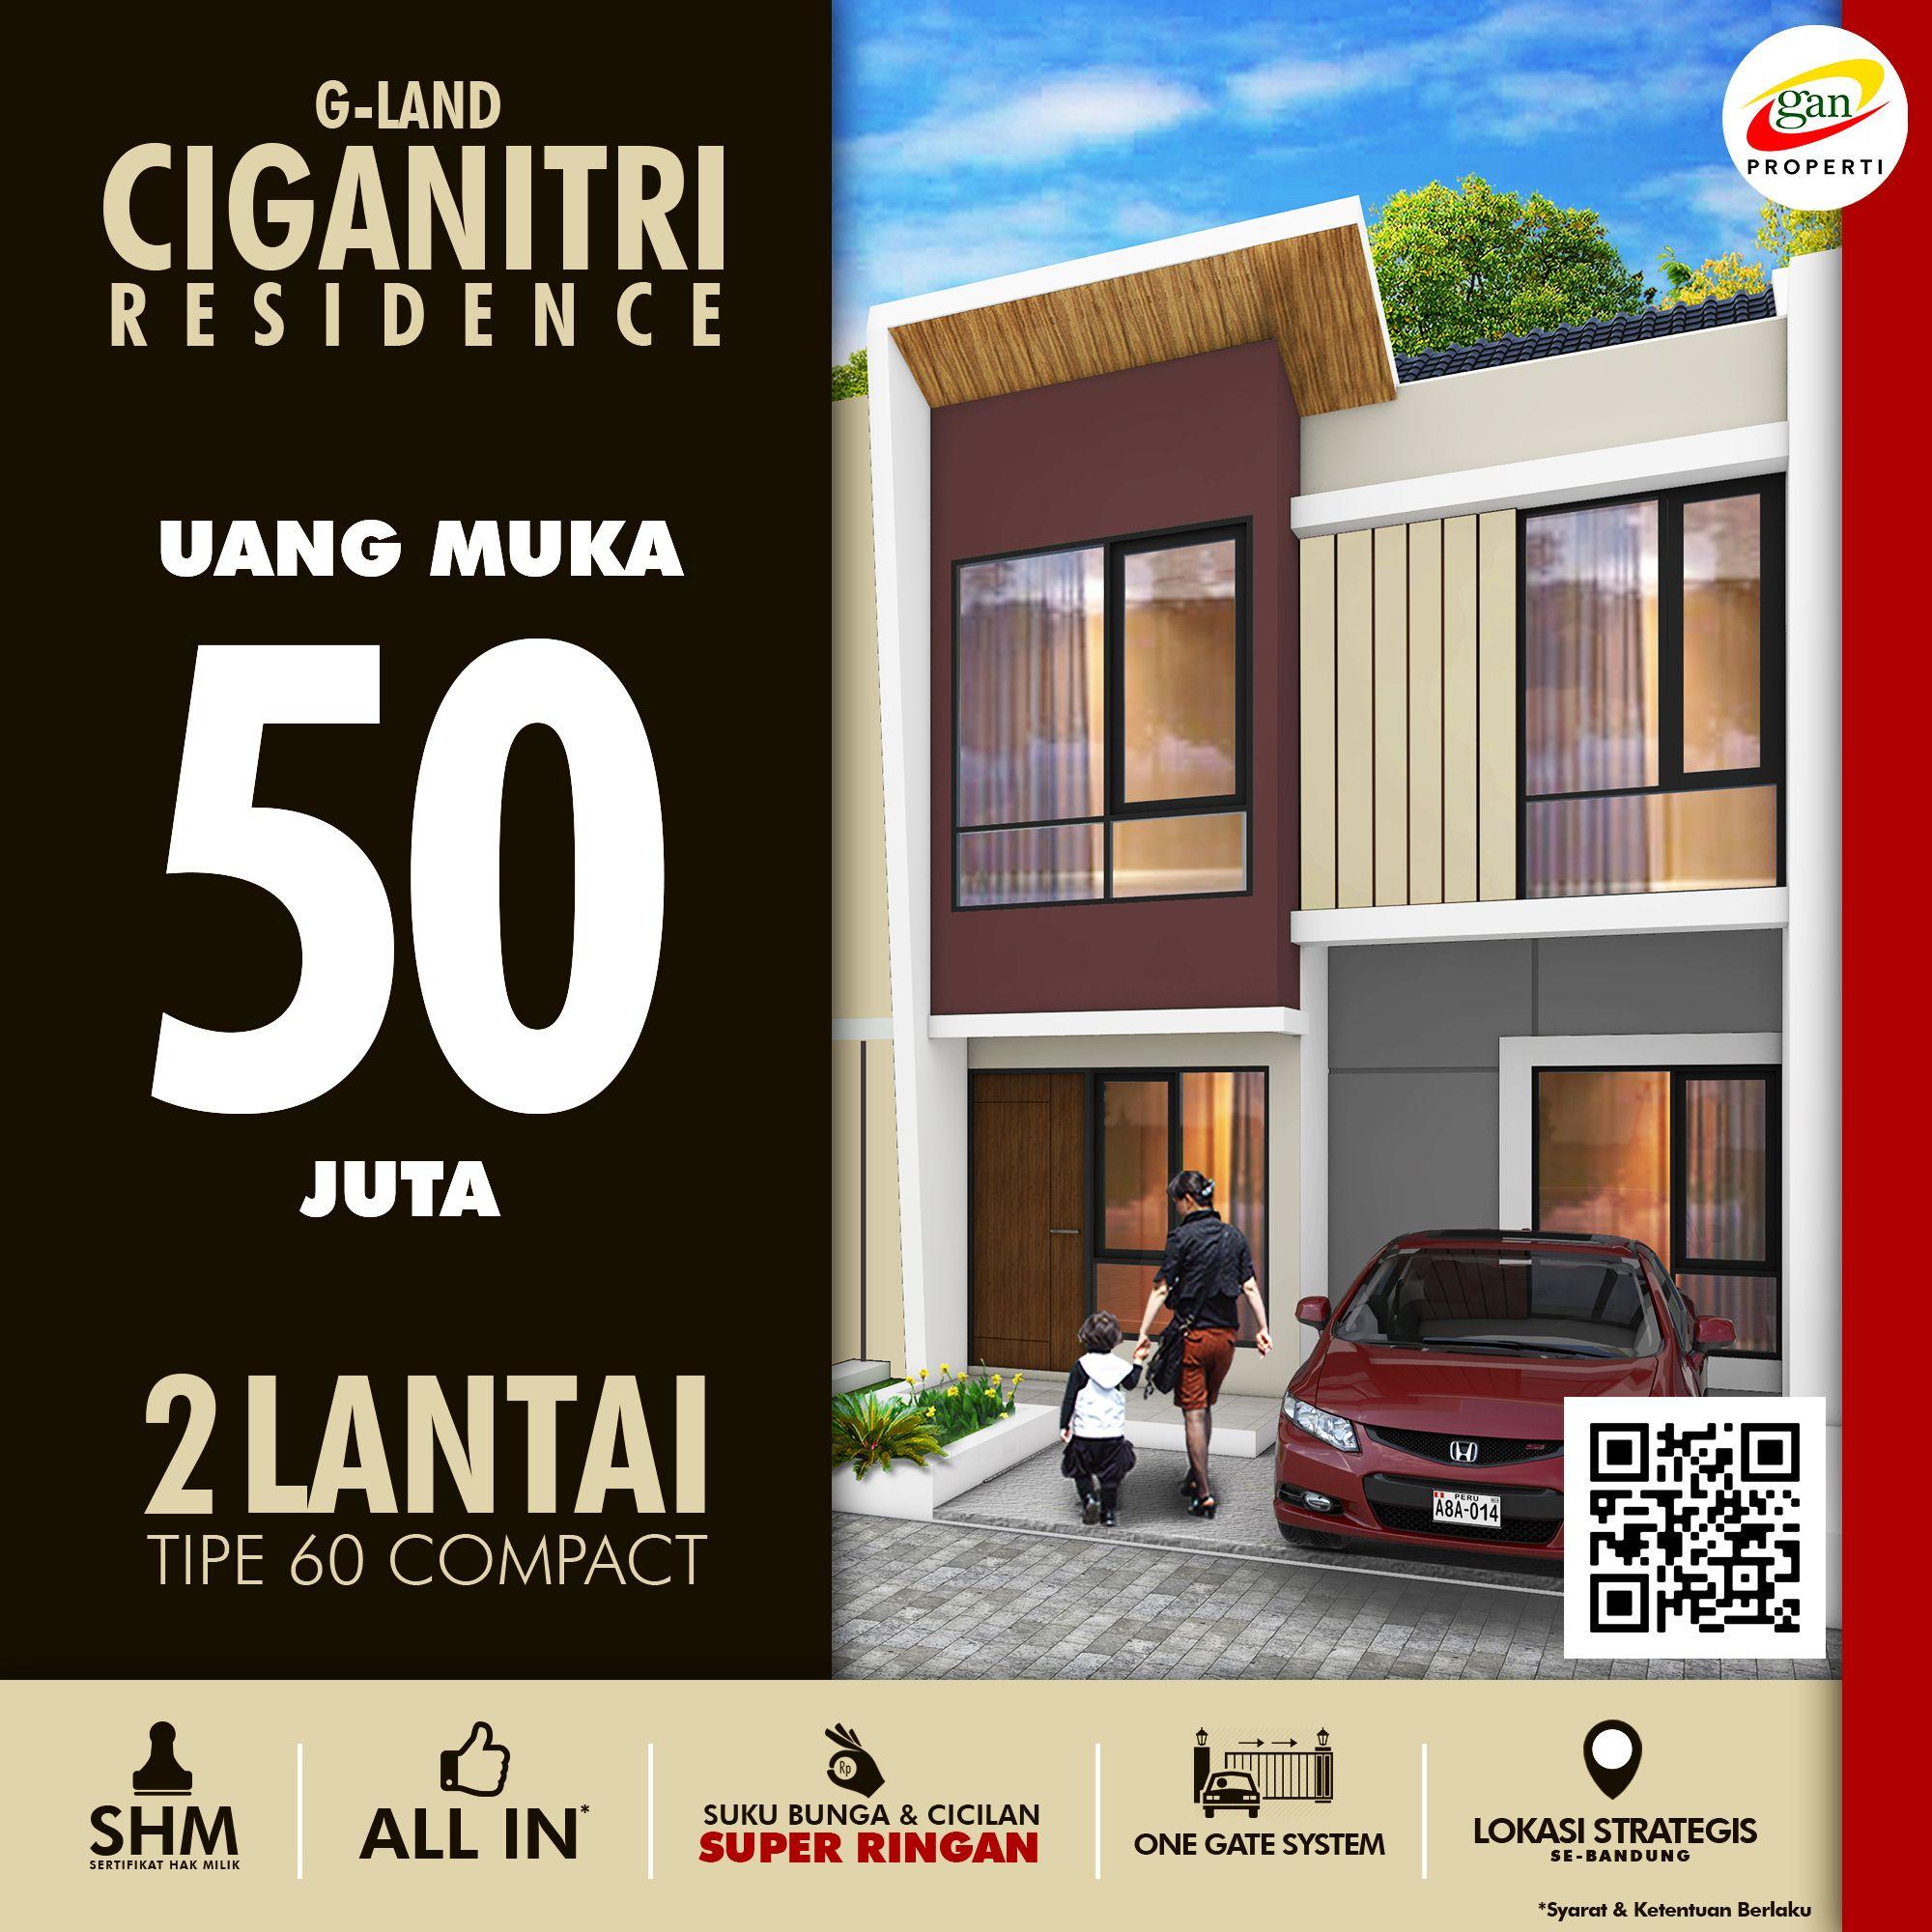 Rumah Bandung Timur Ciganitri Buahbatu 2 Lantai 3 Kamar Tidur Harga Murah Terjangkau Cicilan Ringan Lantai Rumah Rumah Impian